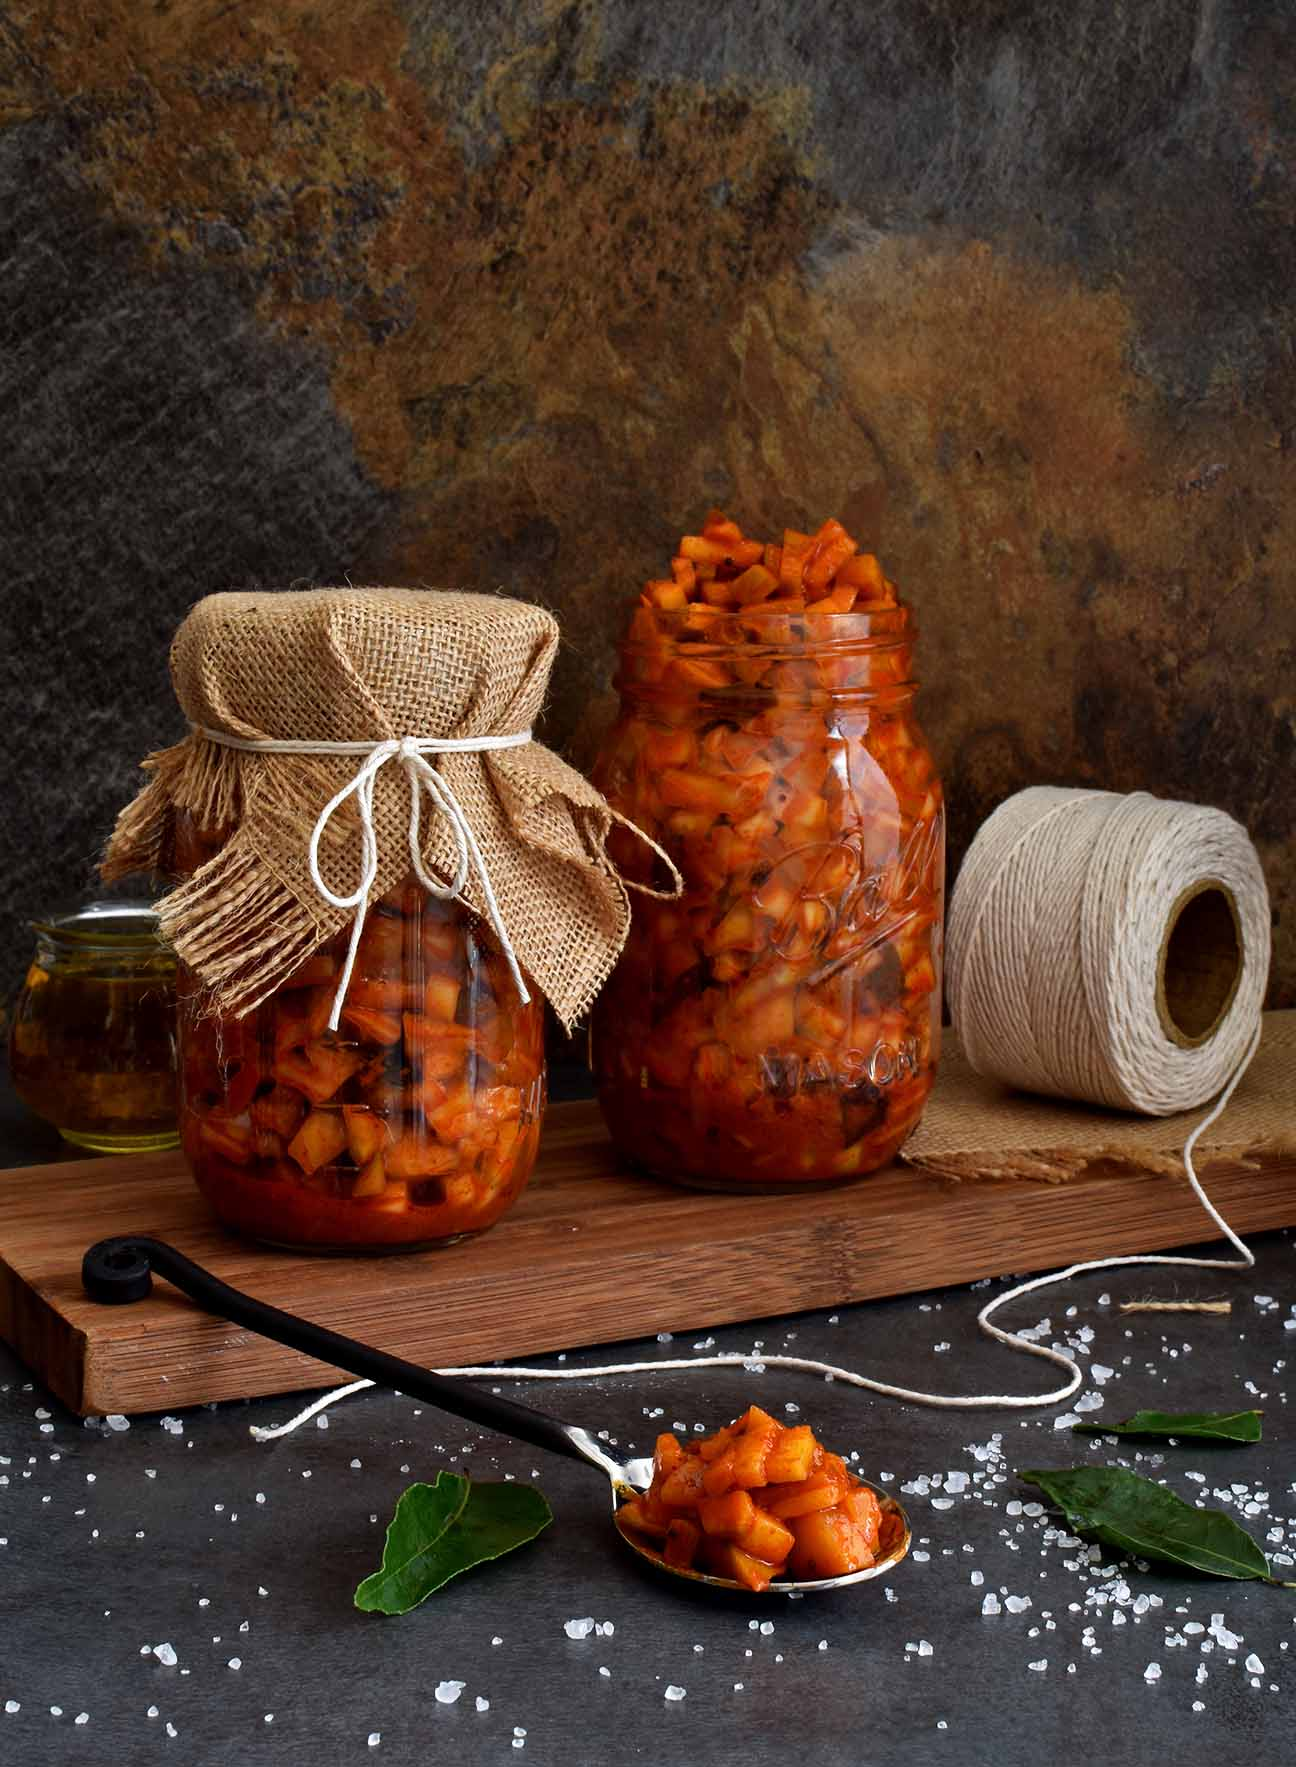 Kerala Style Mango Pickle - Pepper Delight #recipe #kadukumanga #kadumanga #mangopickle #greenmangopickle #achar #aamkaachar #pickle #instantmangopickle #kerala #onam #vishu #sadya #indianrecipes #nadan